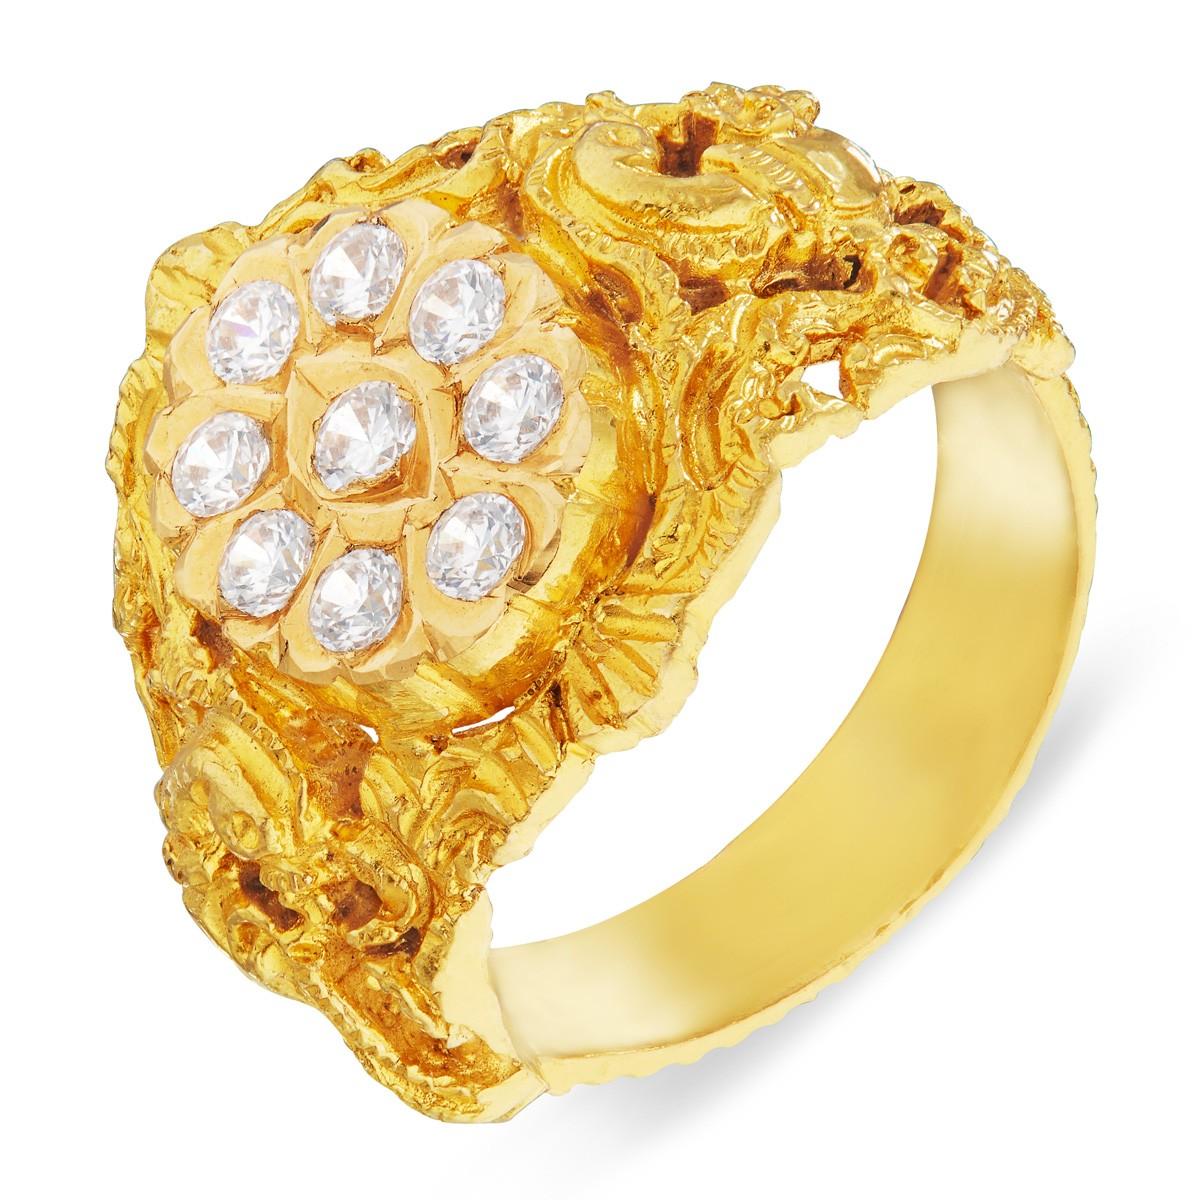 Naga Stone Ring | New Gold Ring Online | Normal Design Gold Ring ...